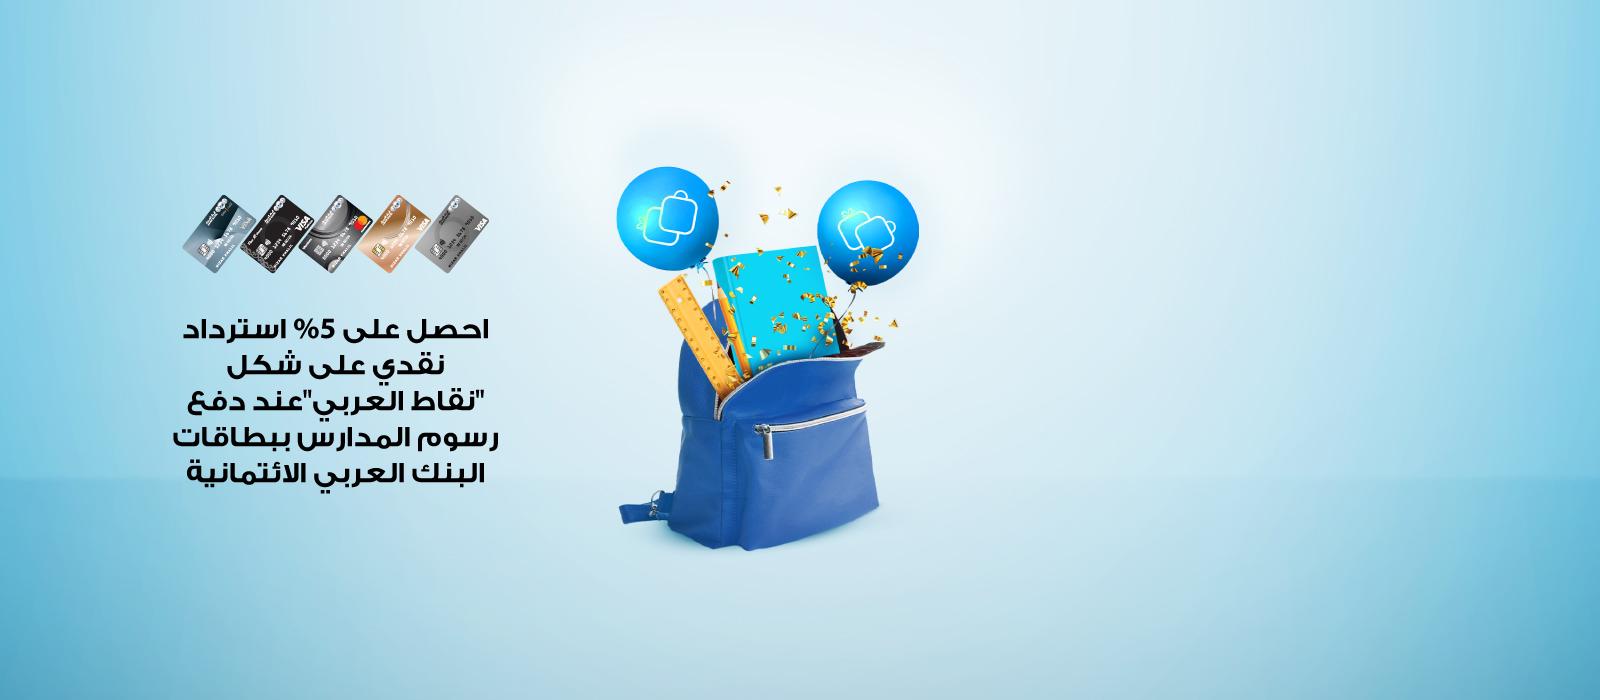 Website-Banner-UAE-A